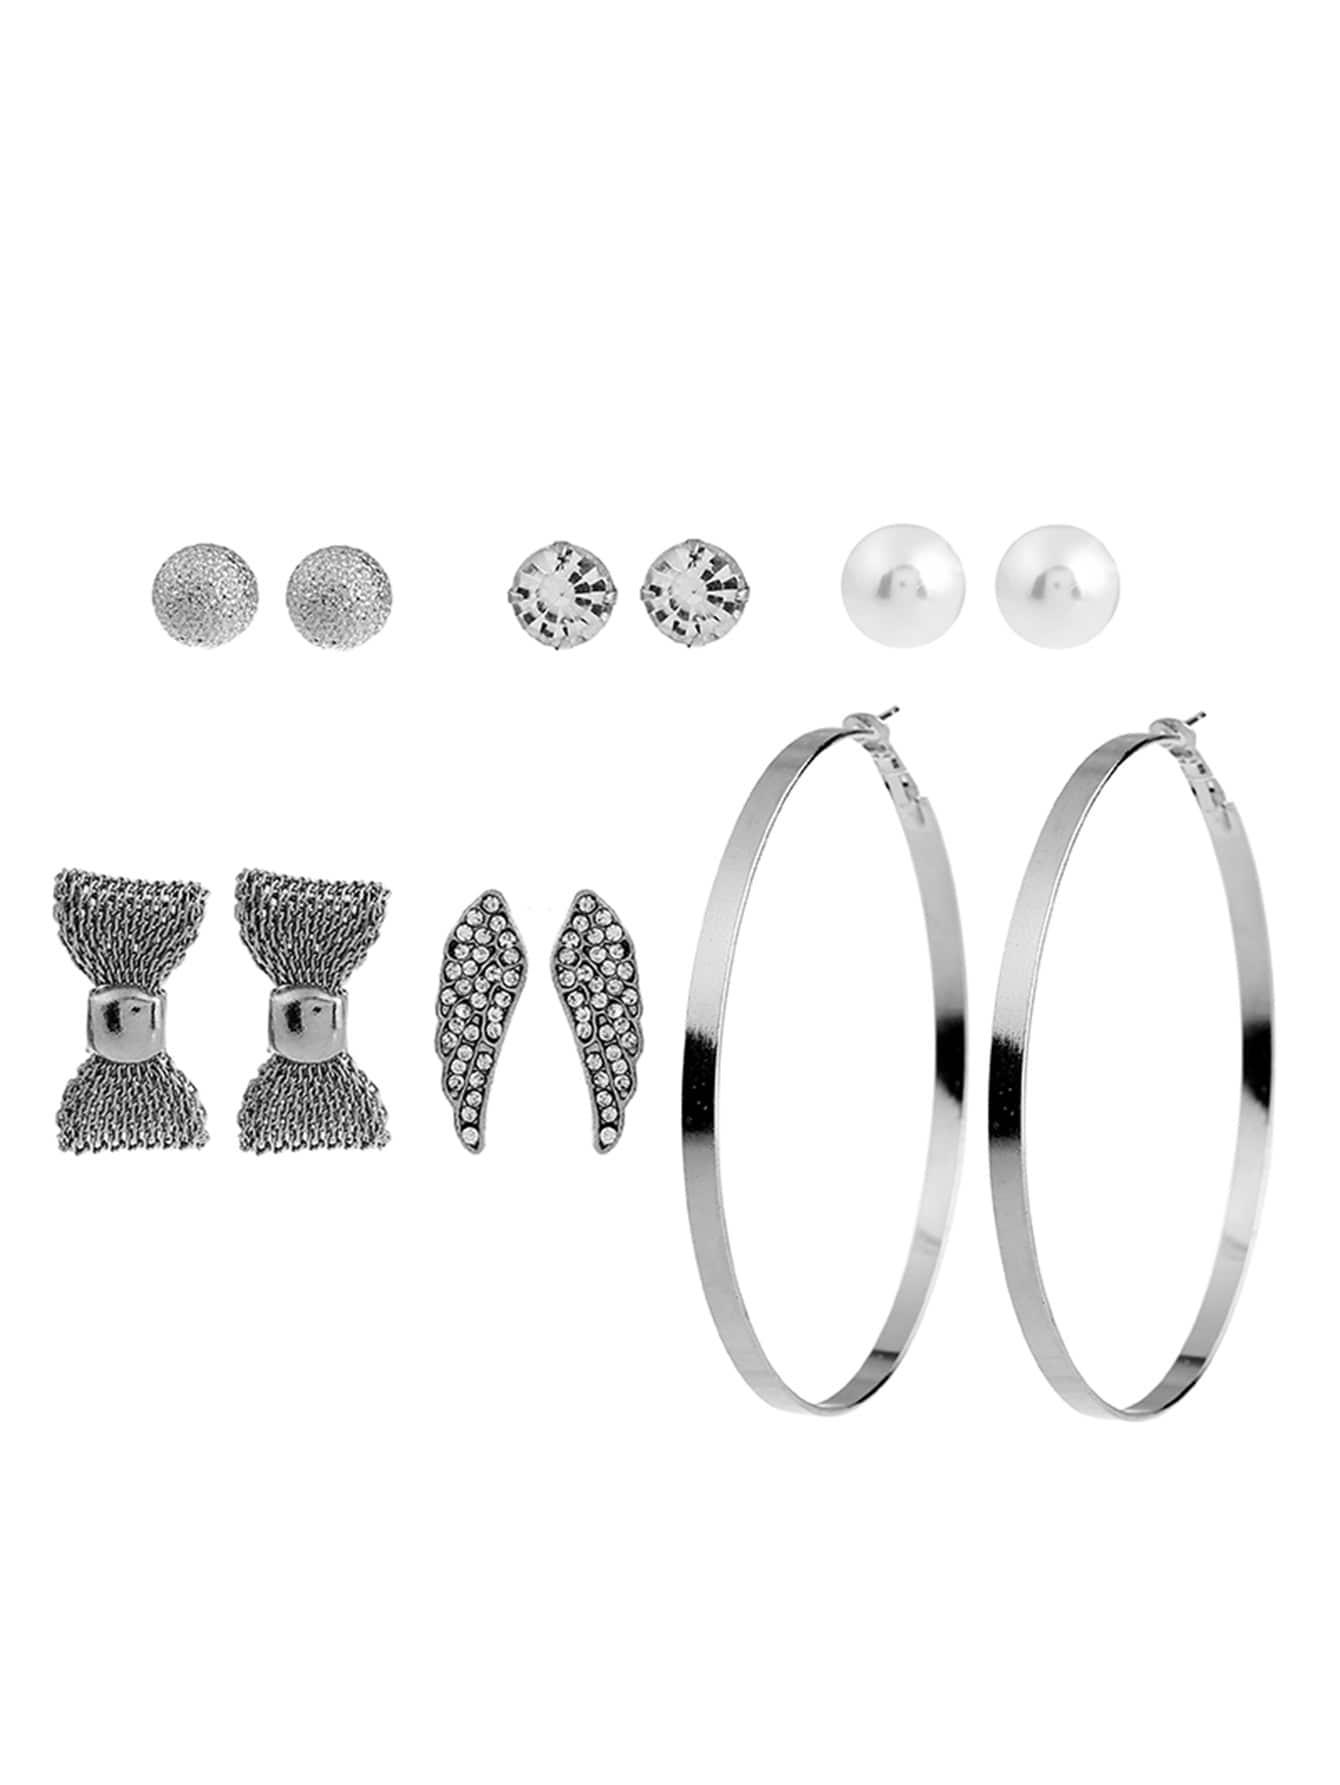 Bow & Round Design Earring Set